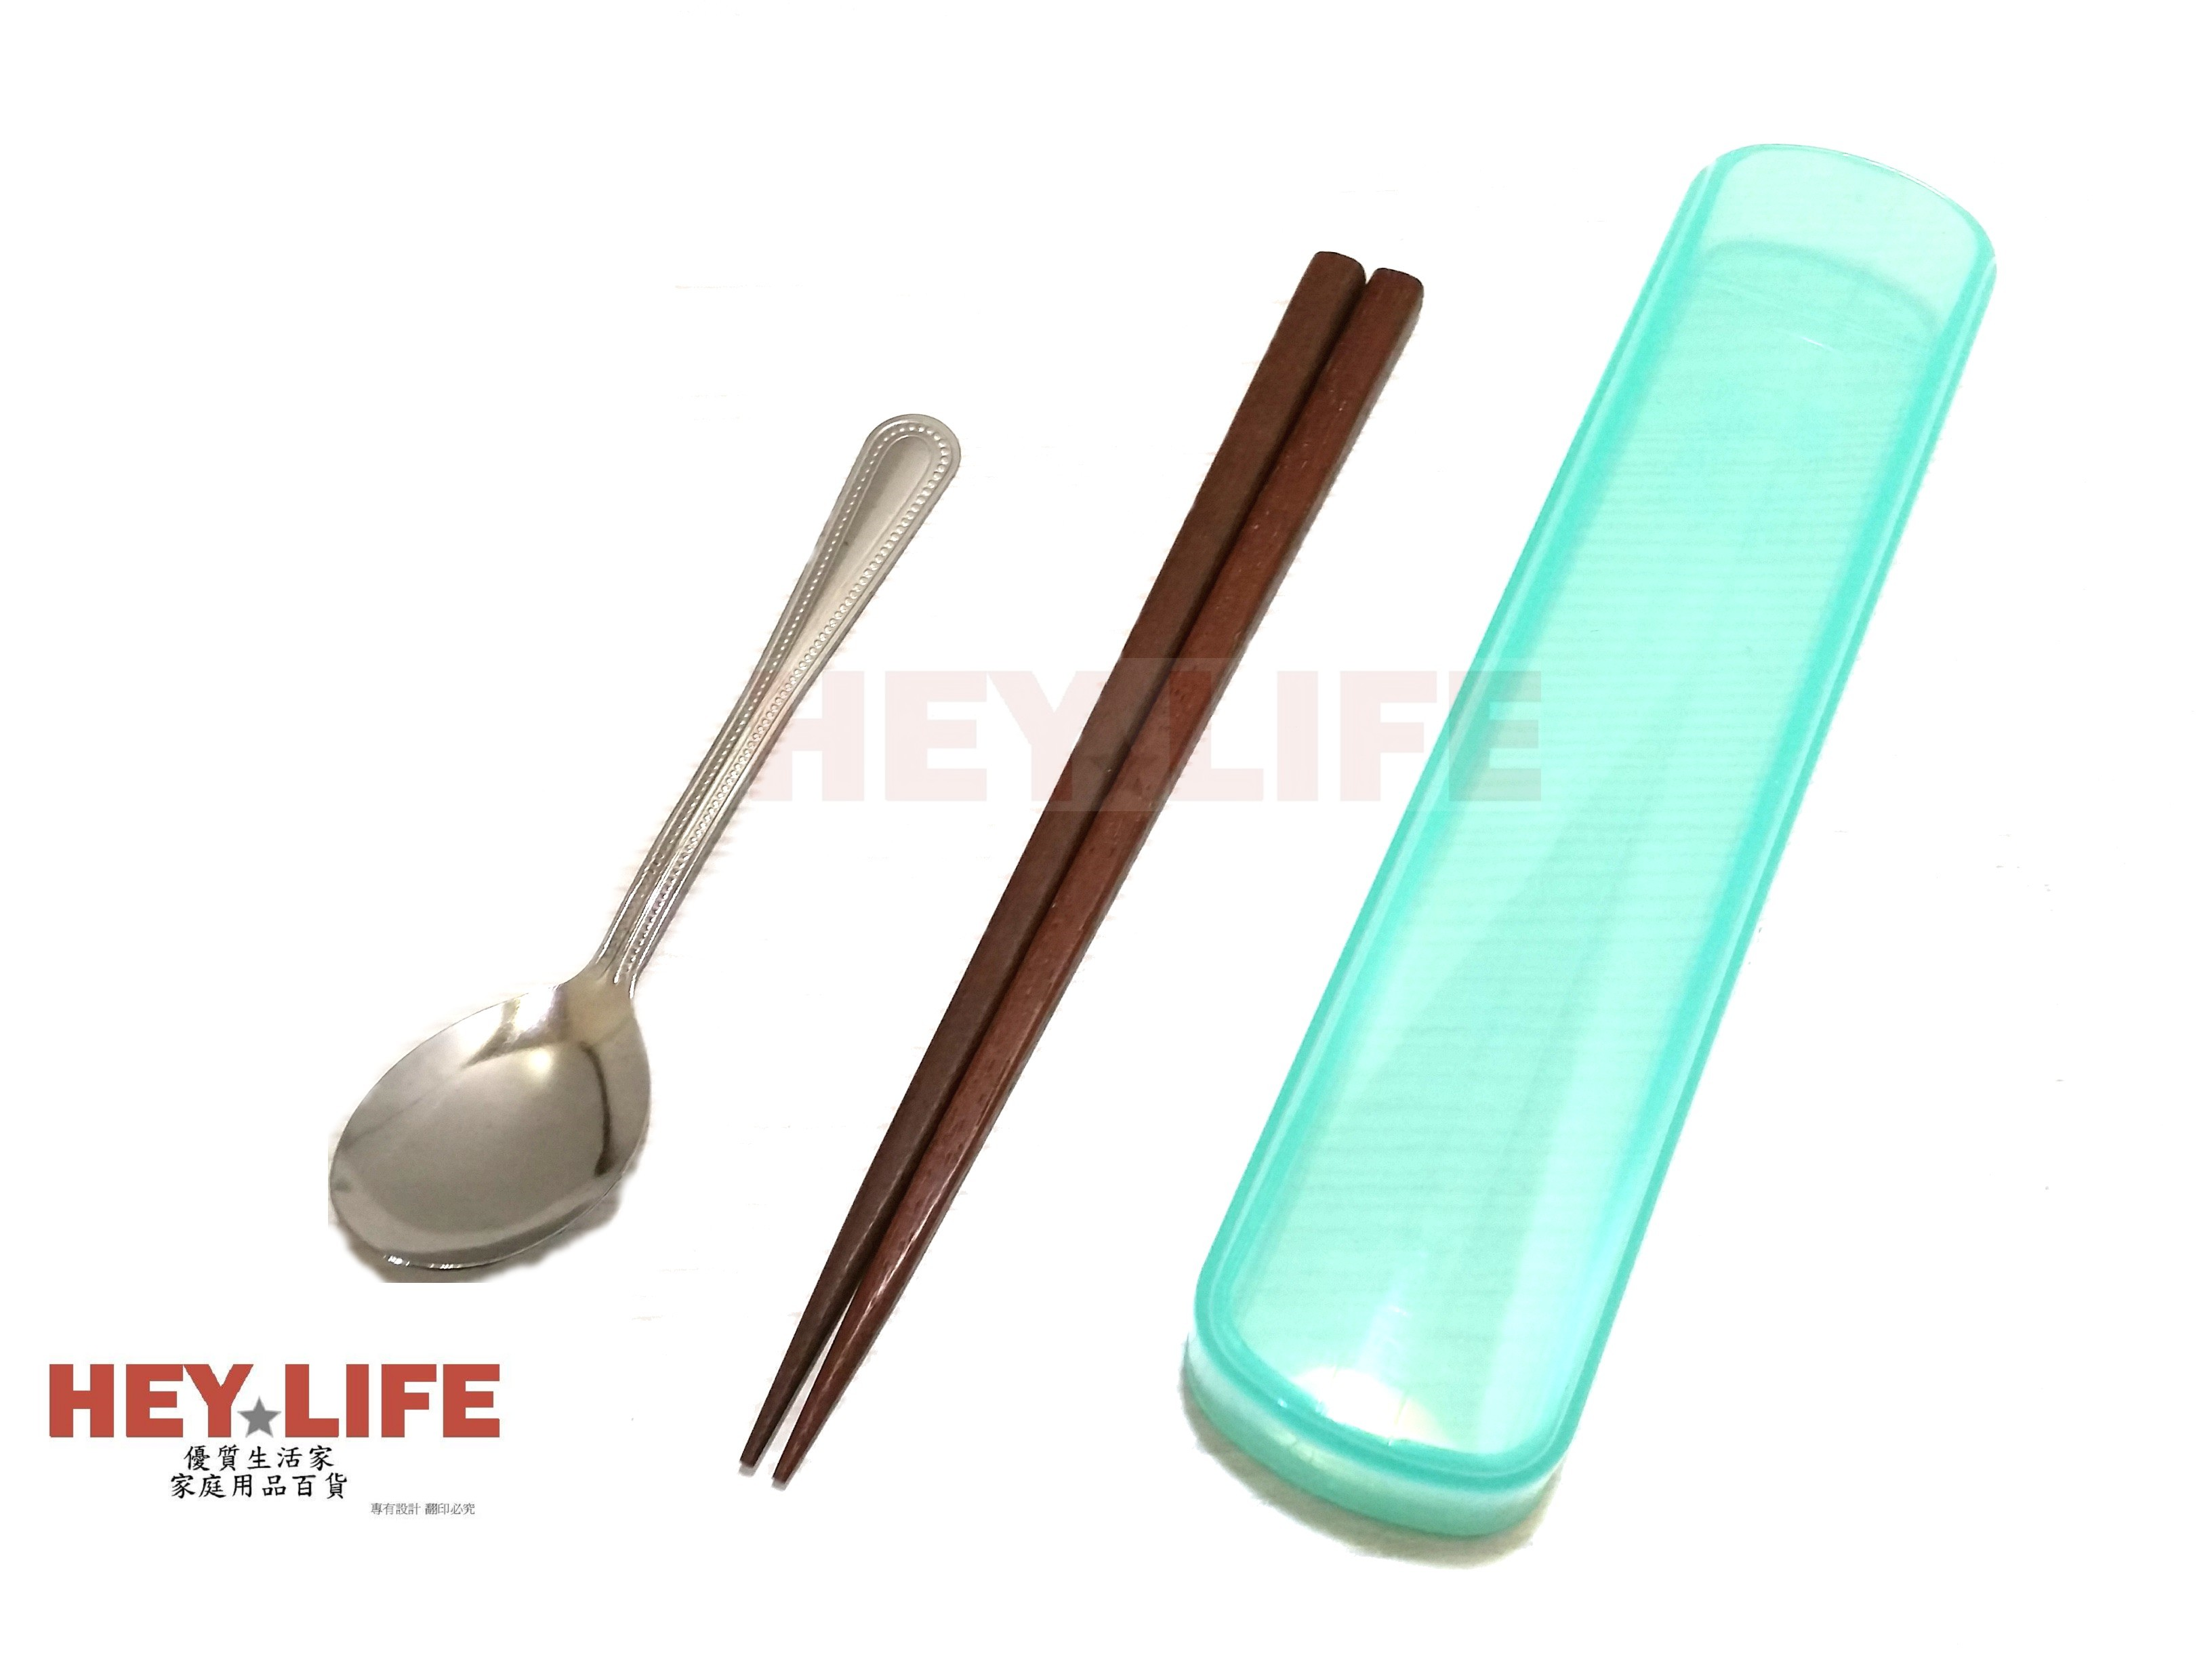 【HEYLIFE優質生活家】快樂環保餐具組 餐具 筷 湯匙 盒 優質嚴選 品質保證